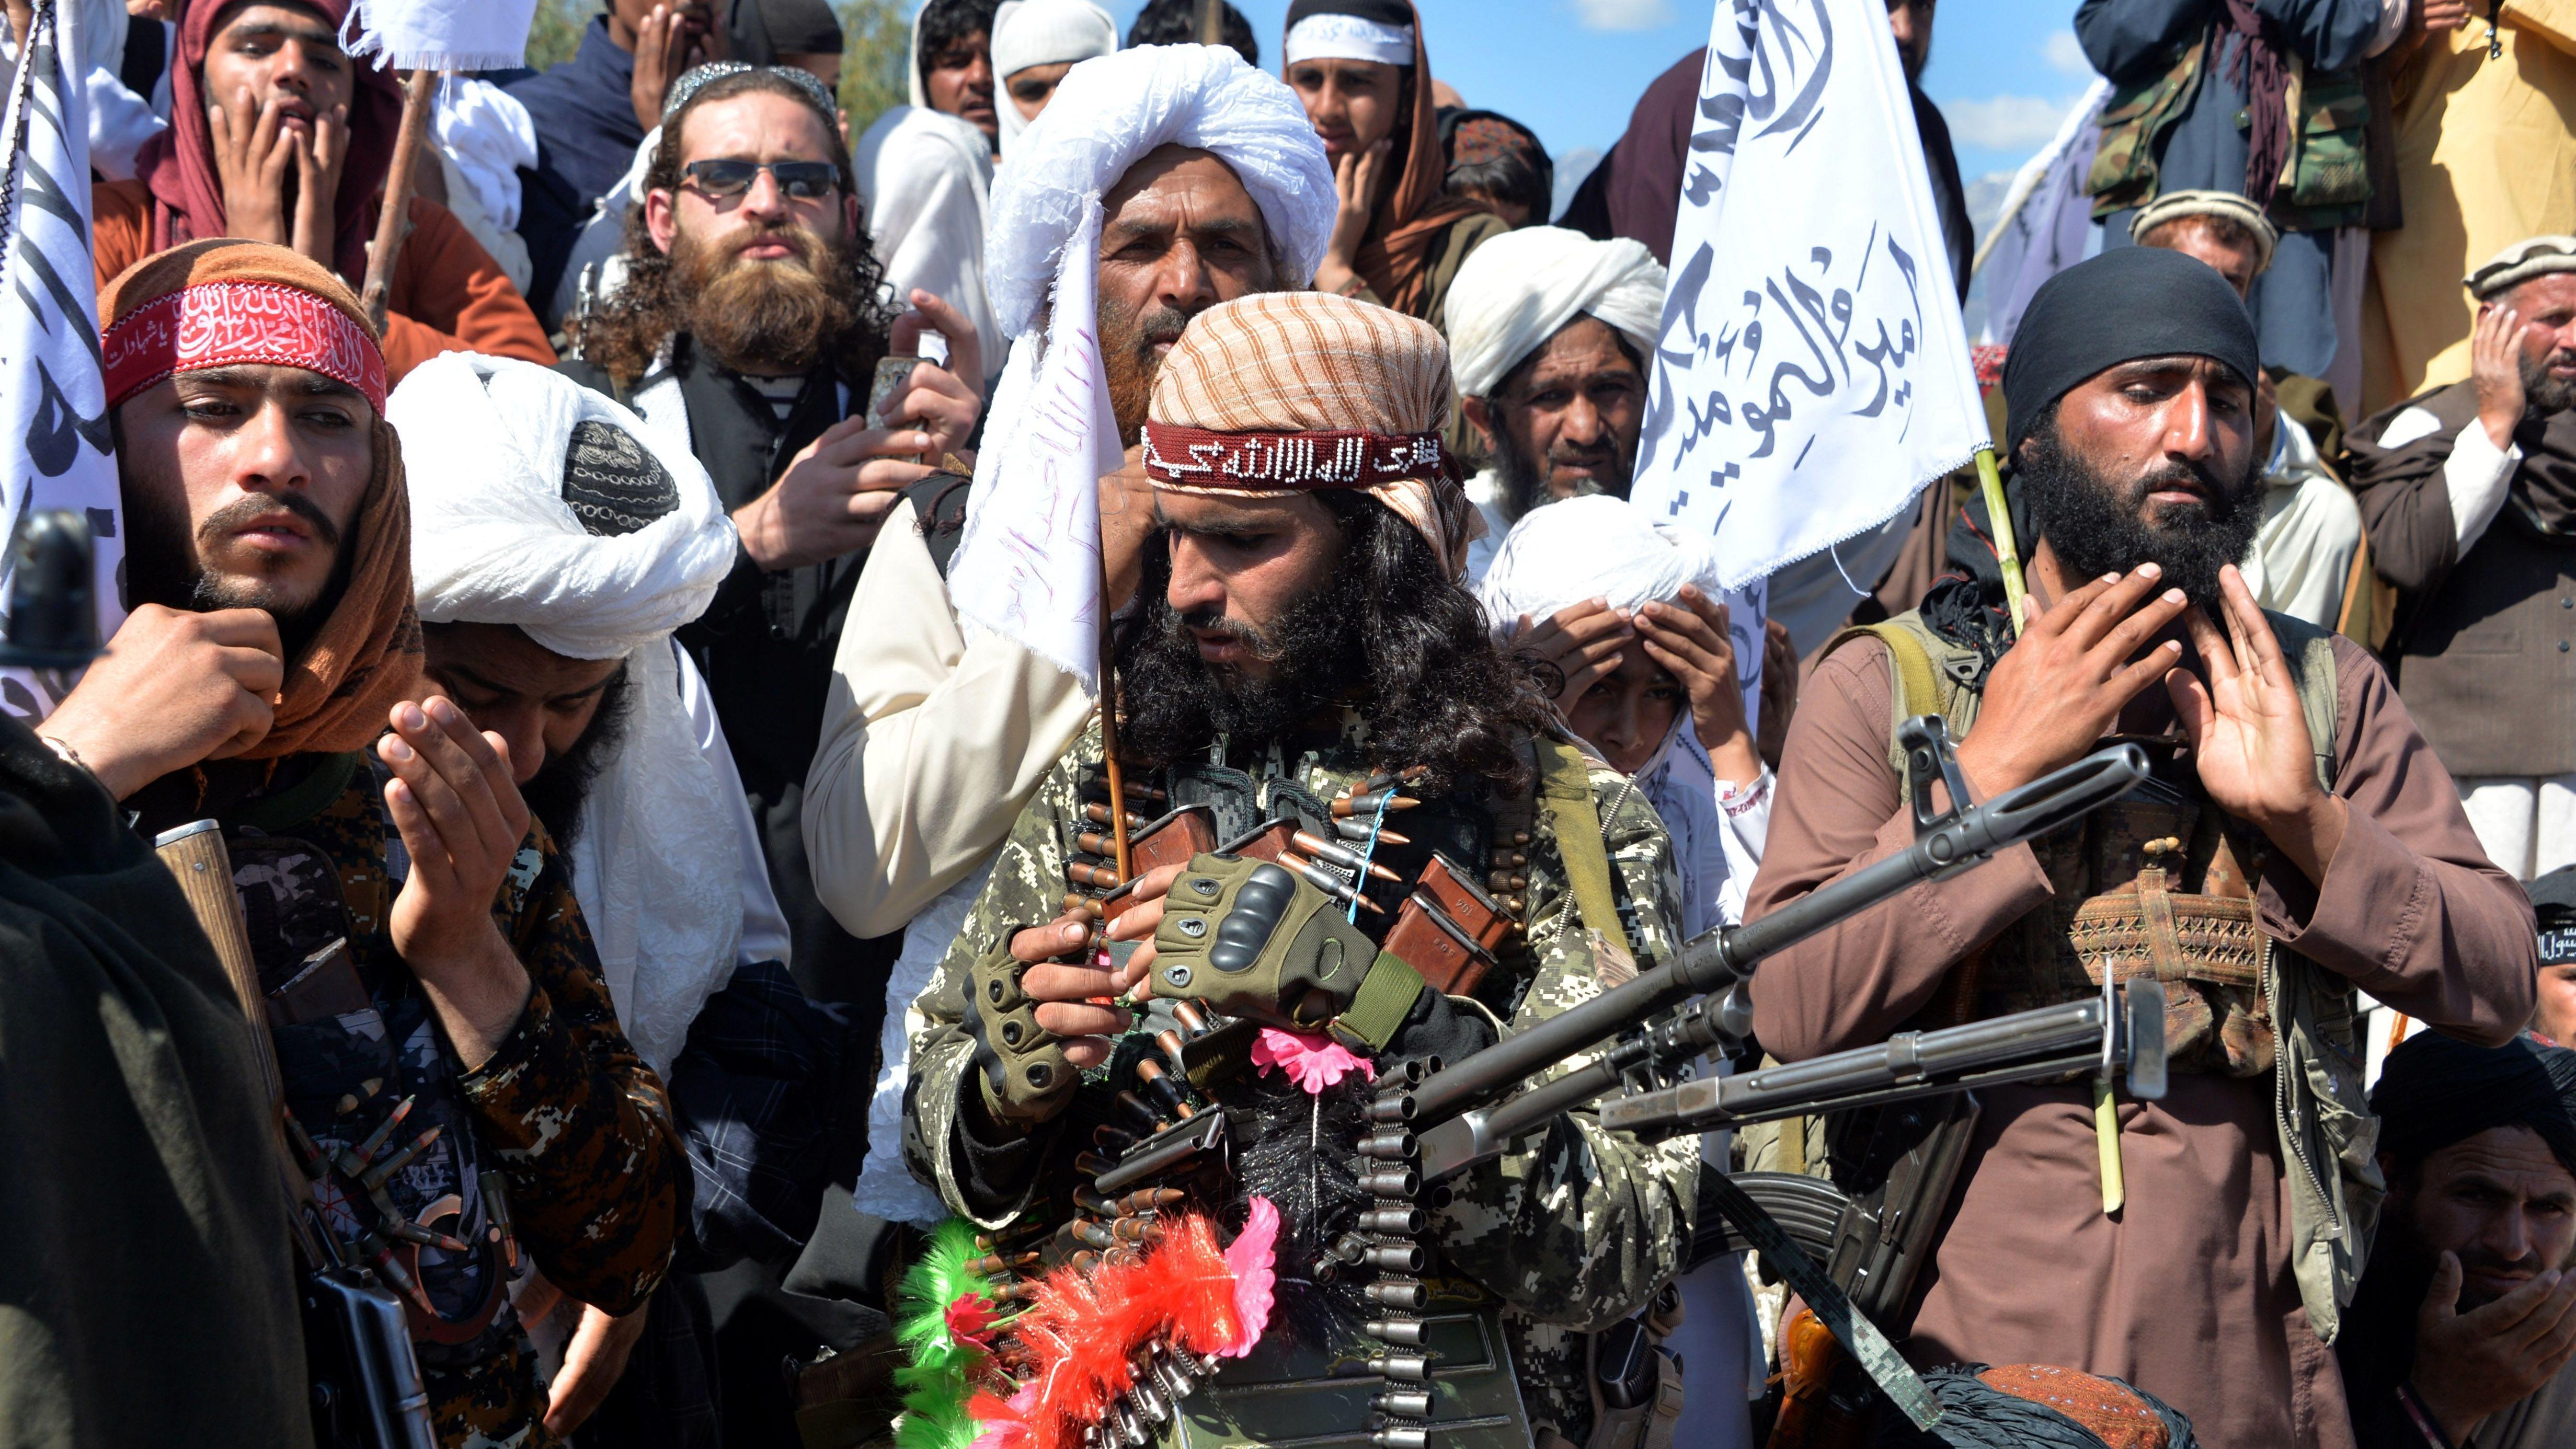 Afghan conflict: Top court backs war crimes probe